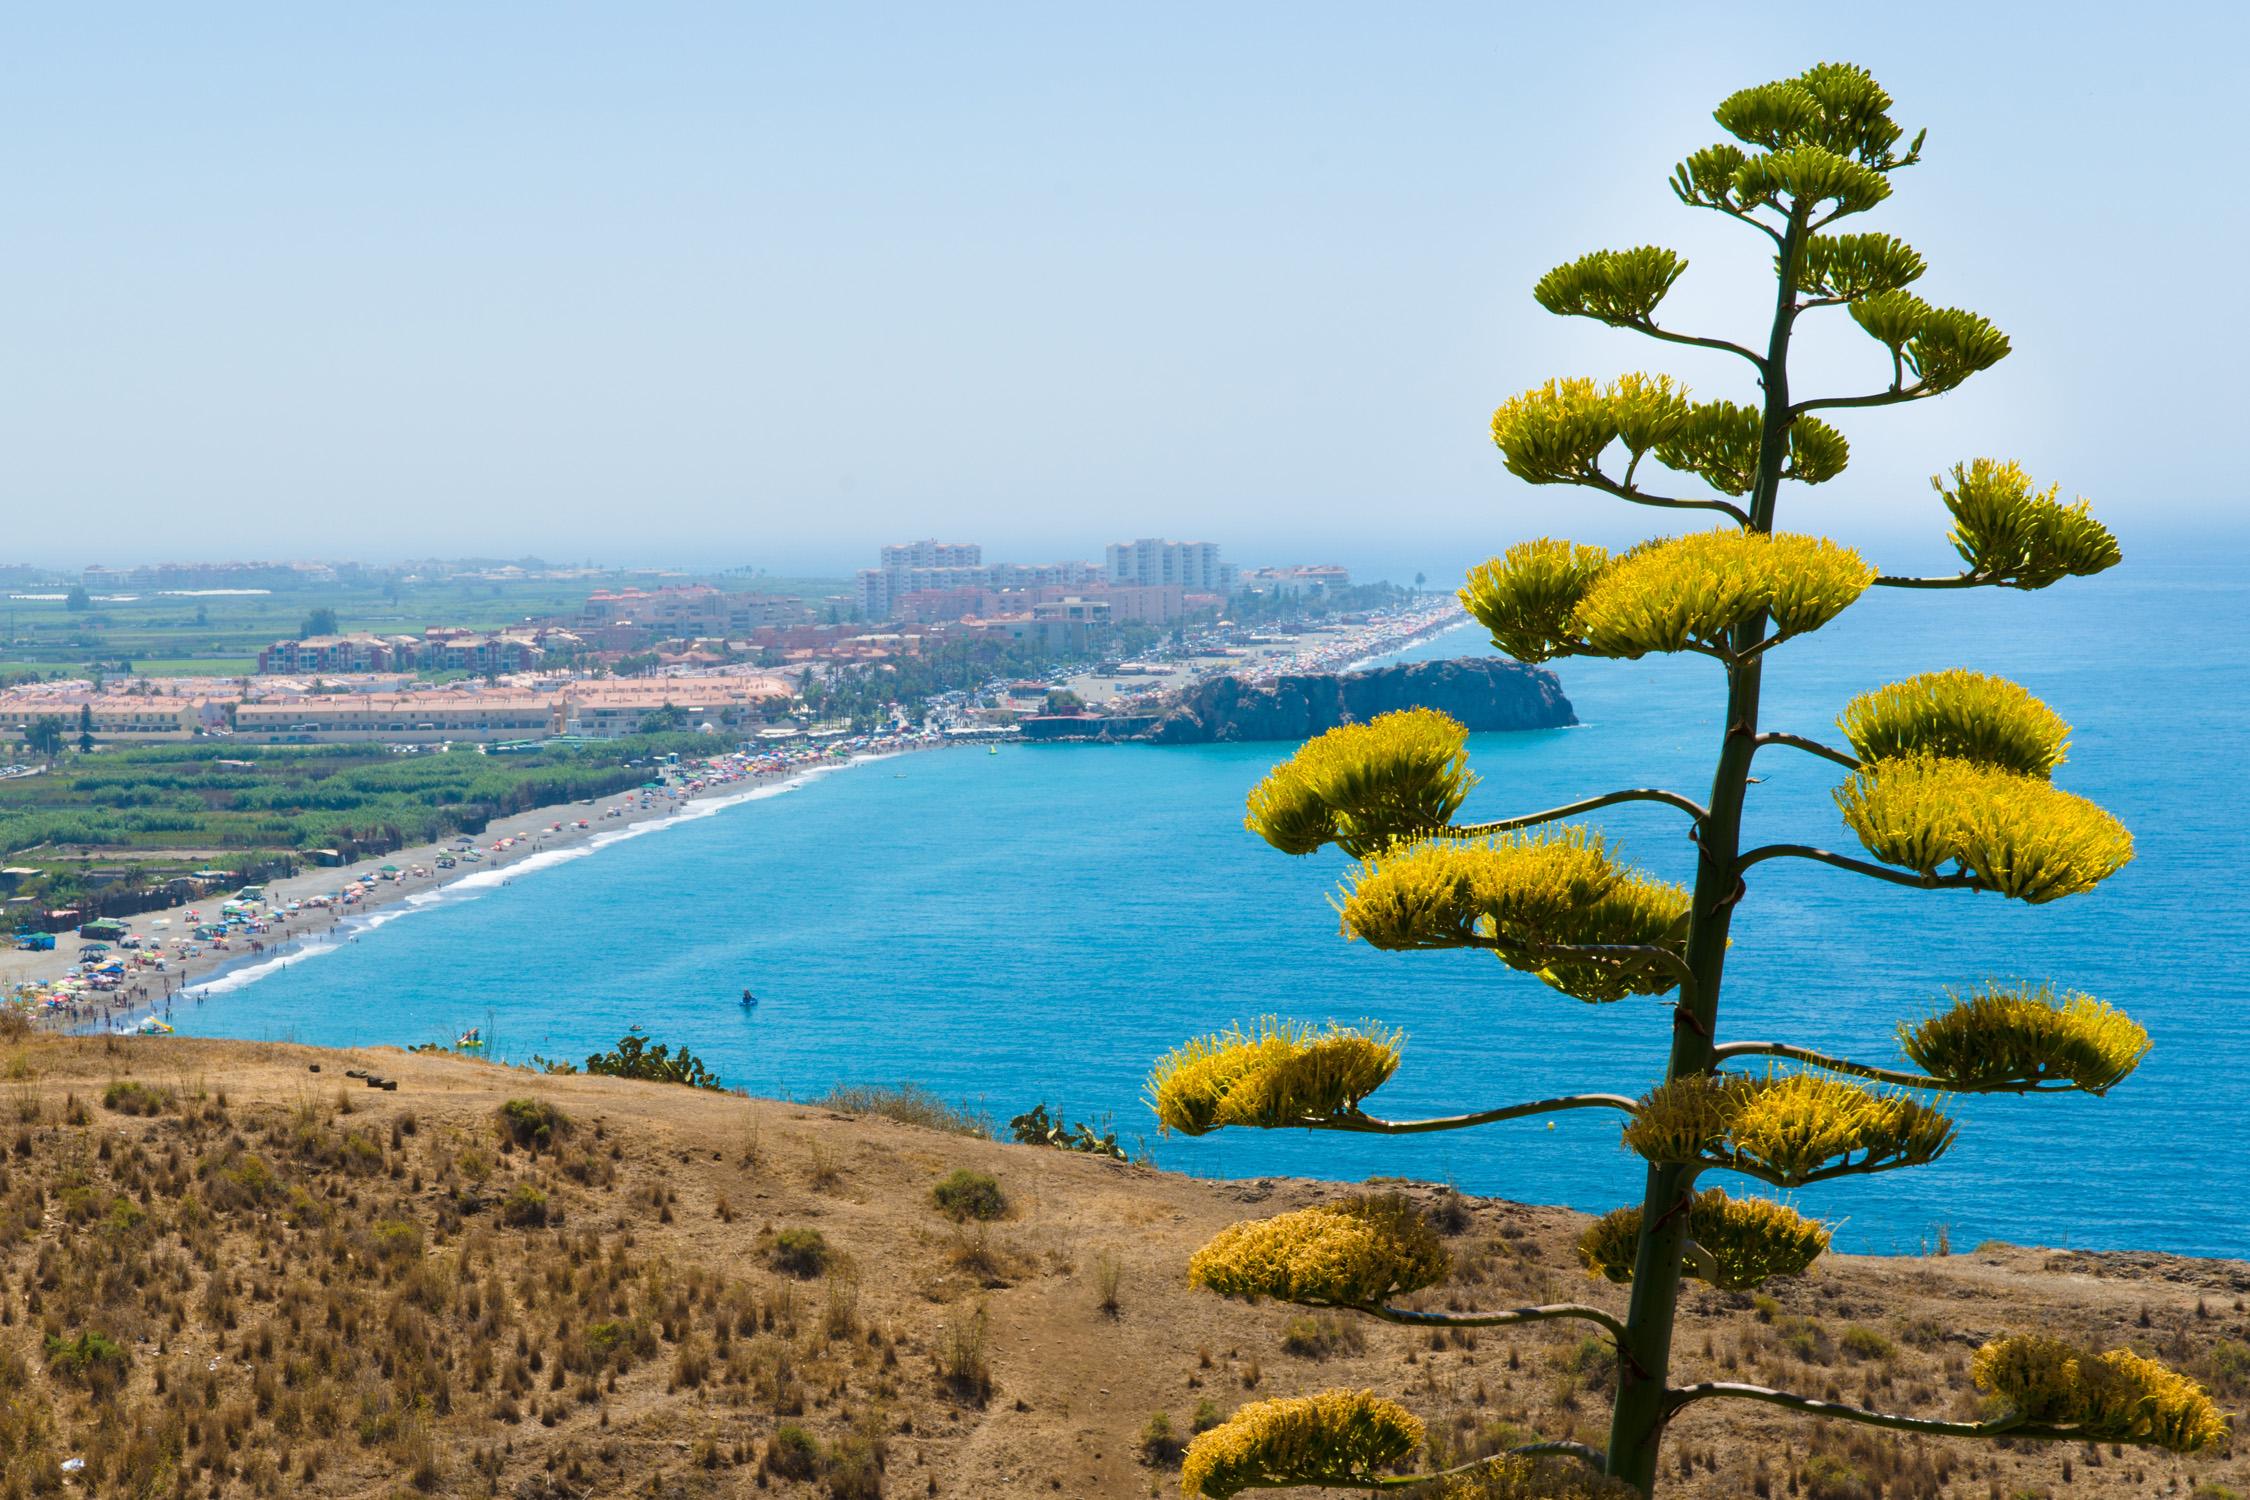 Flug Und Hotel In Almeria